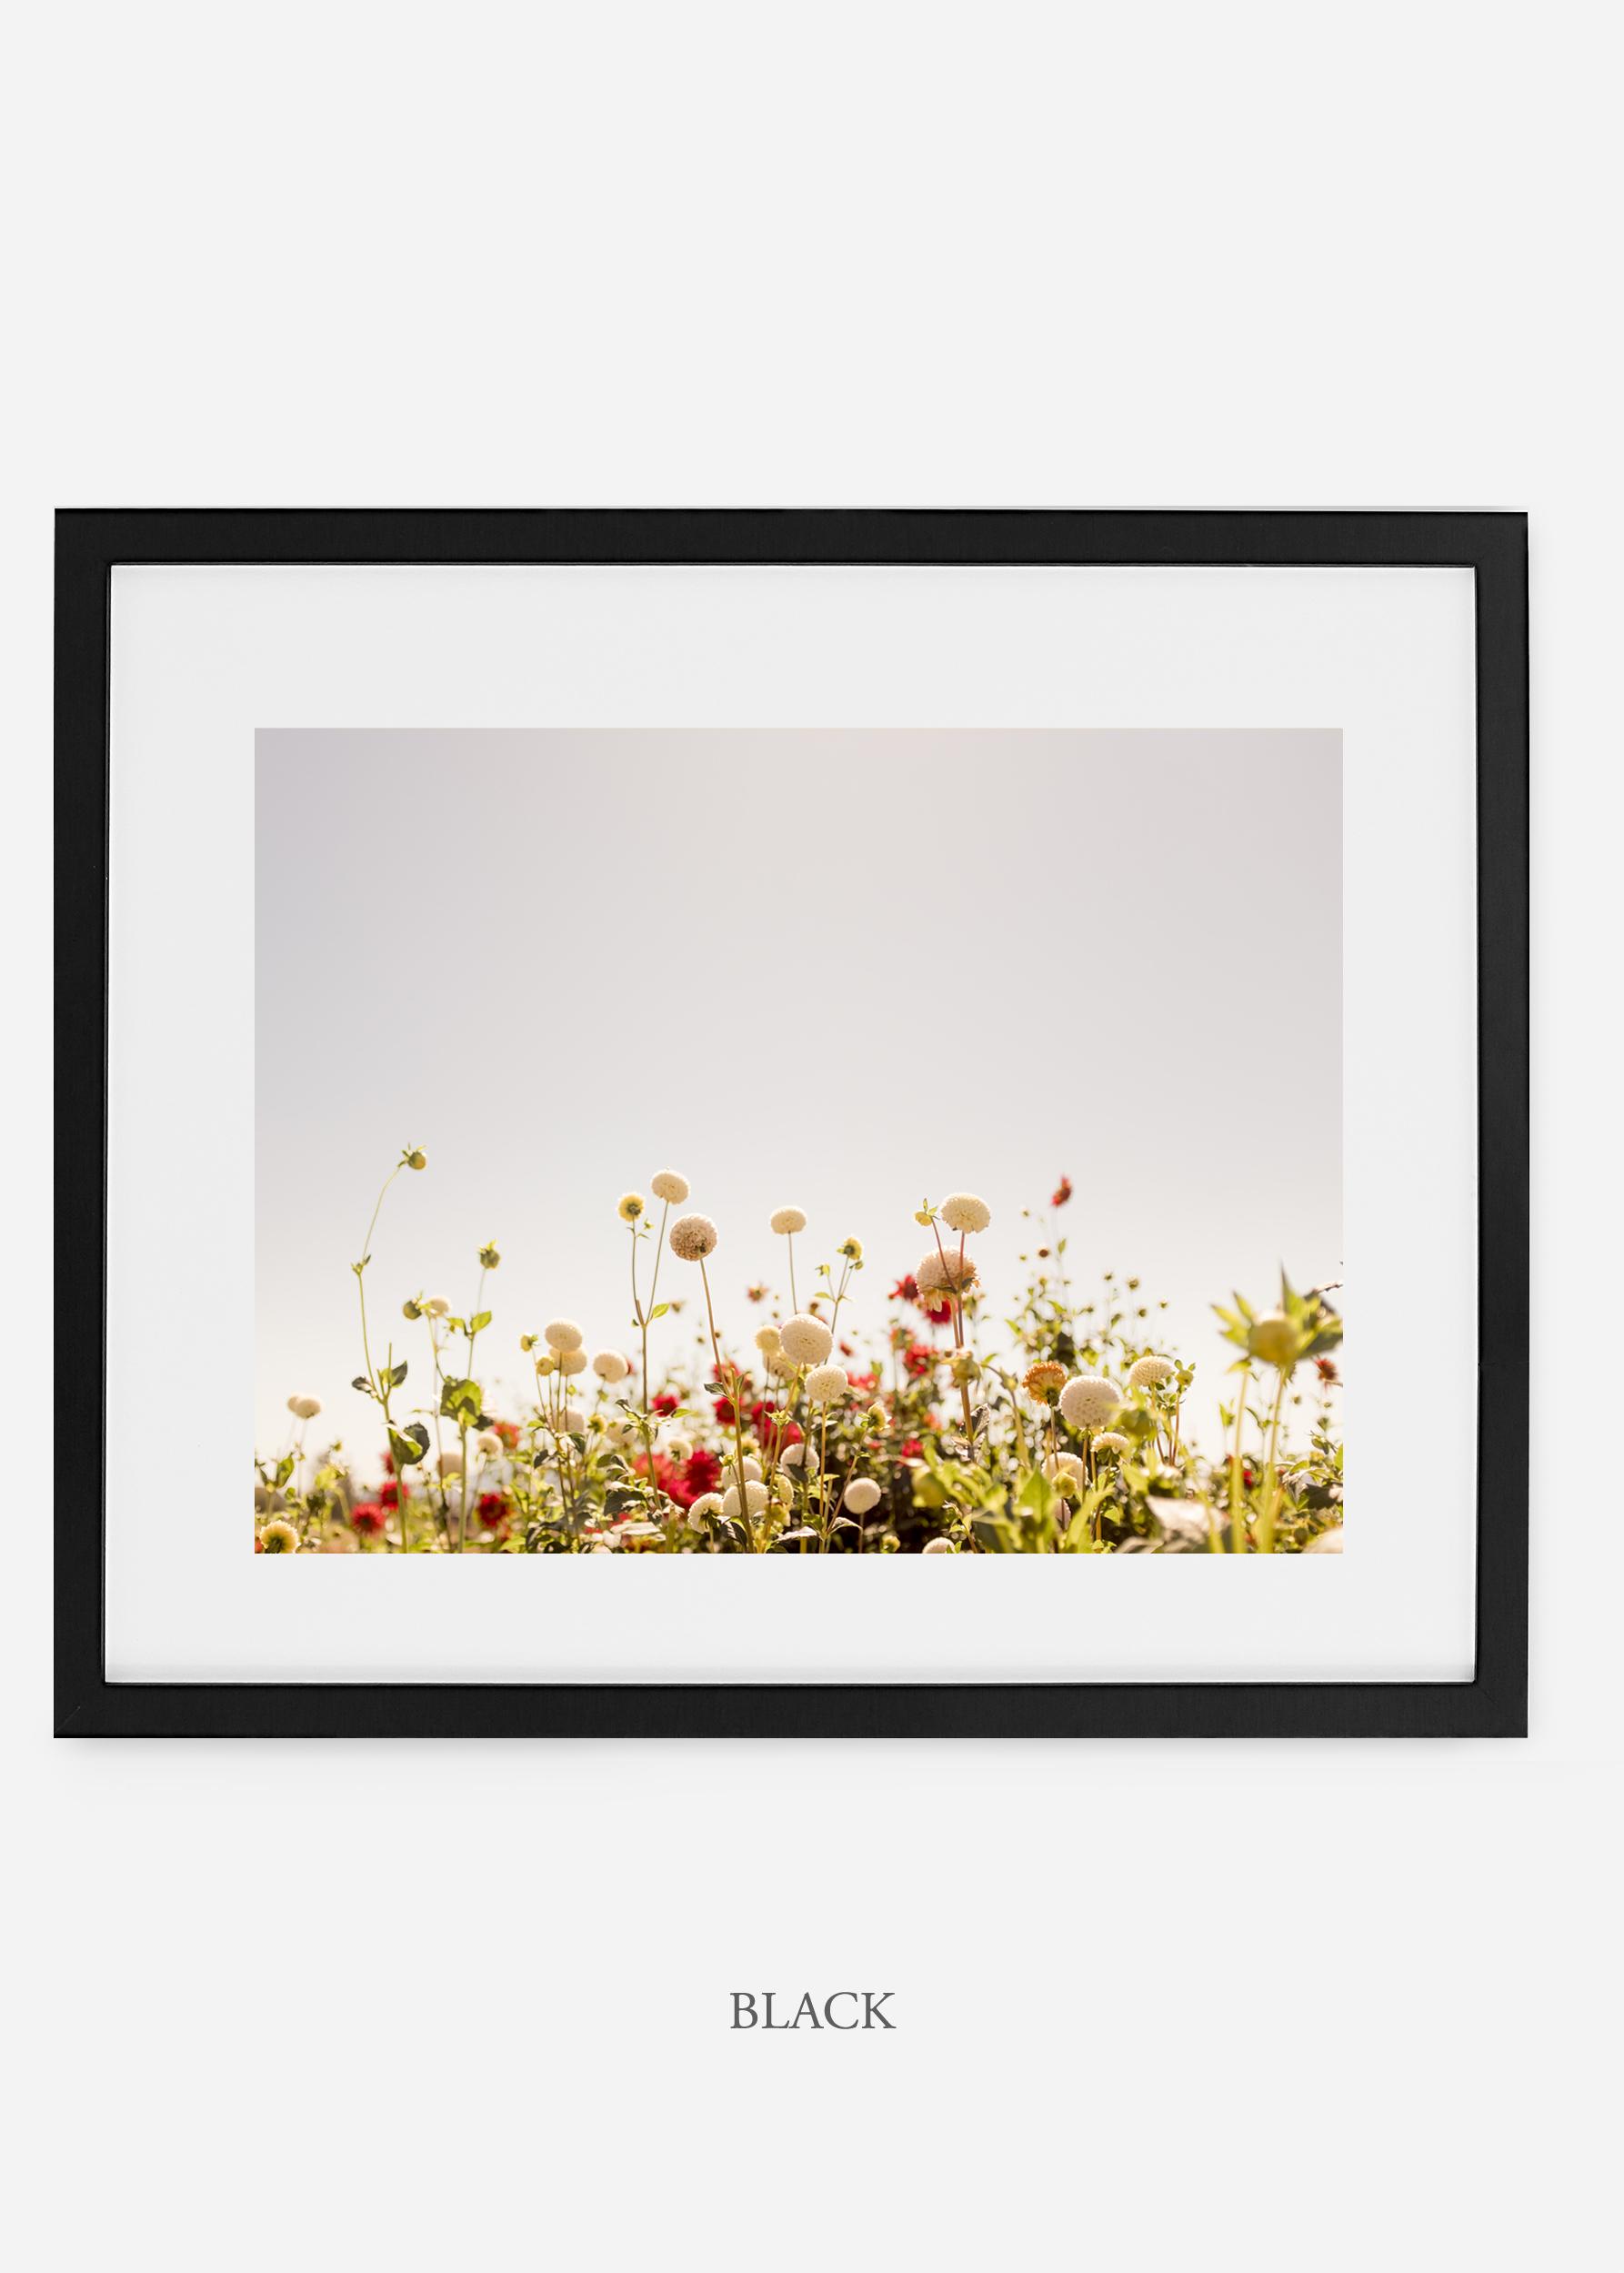 wilder-california-blackframe-dahlia-5-minimal-botanical-print-art-interior-design.jpg